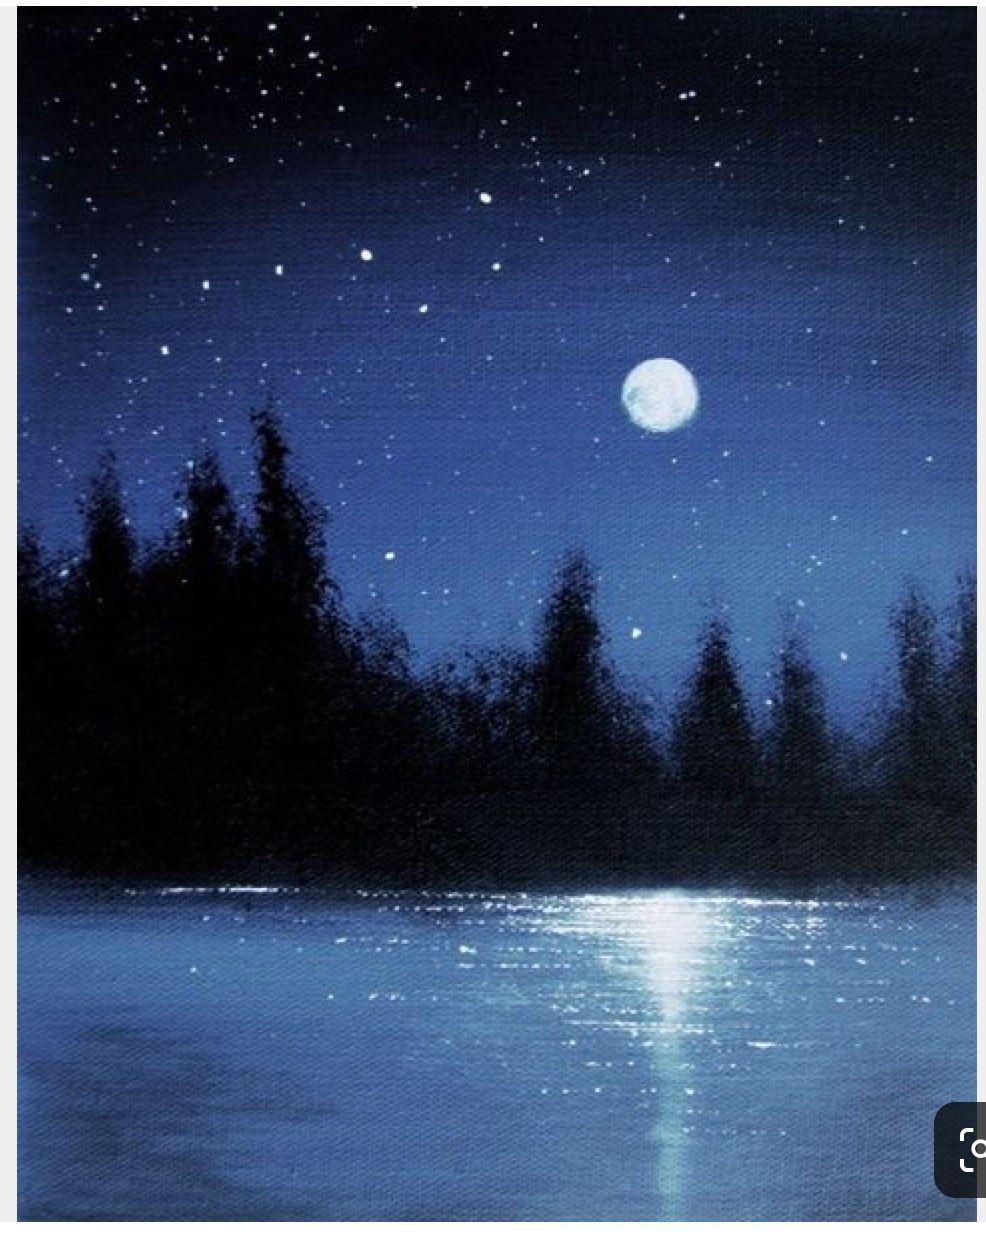 Pin By Pat Maloney On Pass Time Ideas Moonlight Painting Night Sky Painting Moon Painting